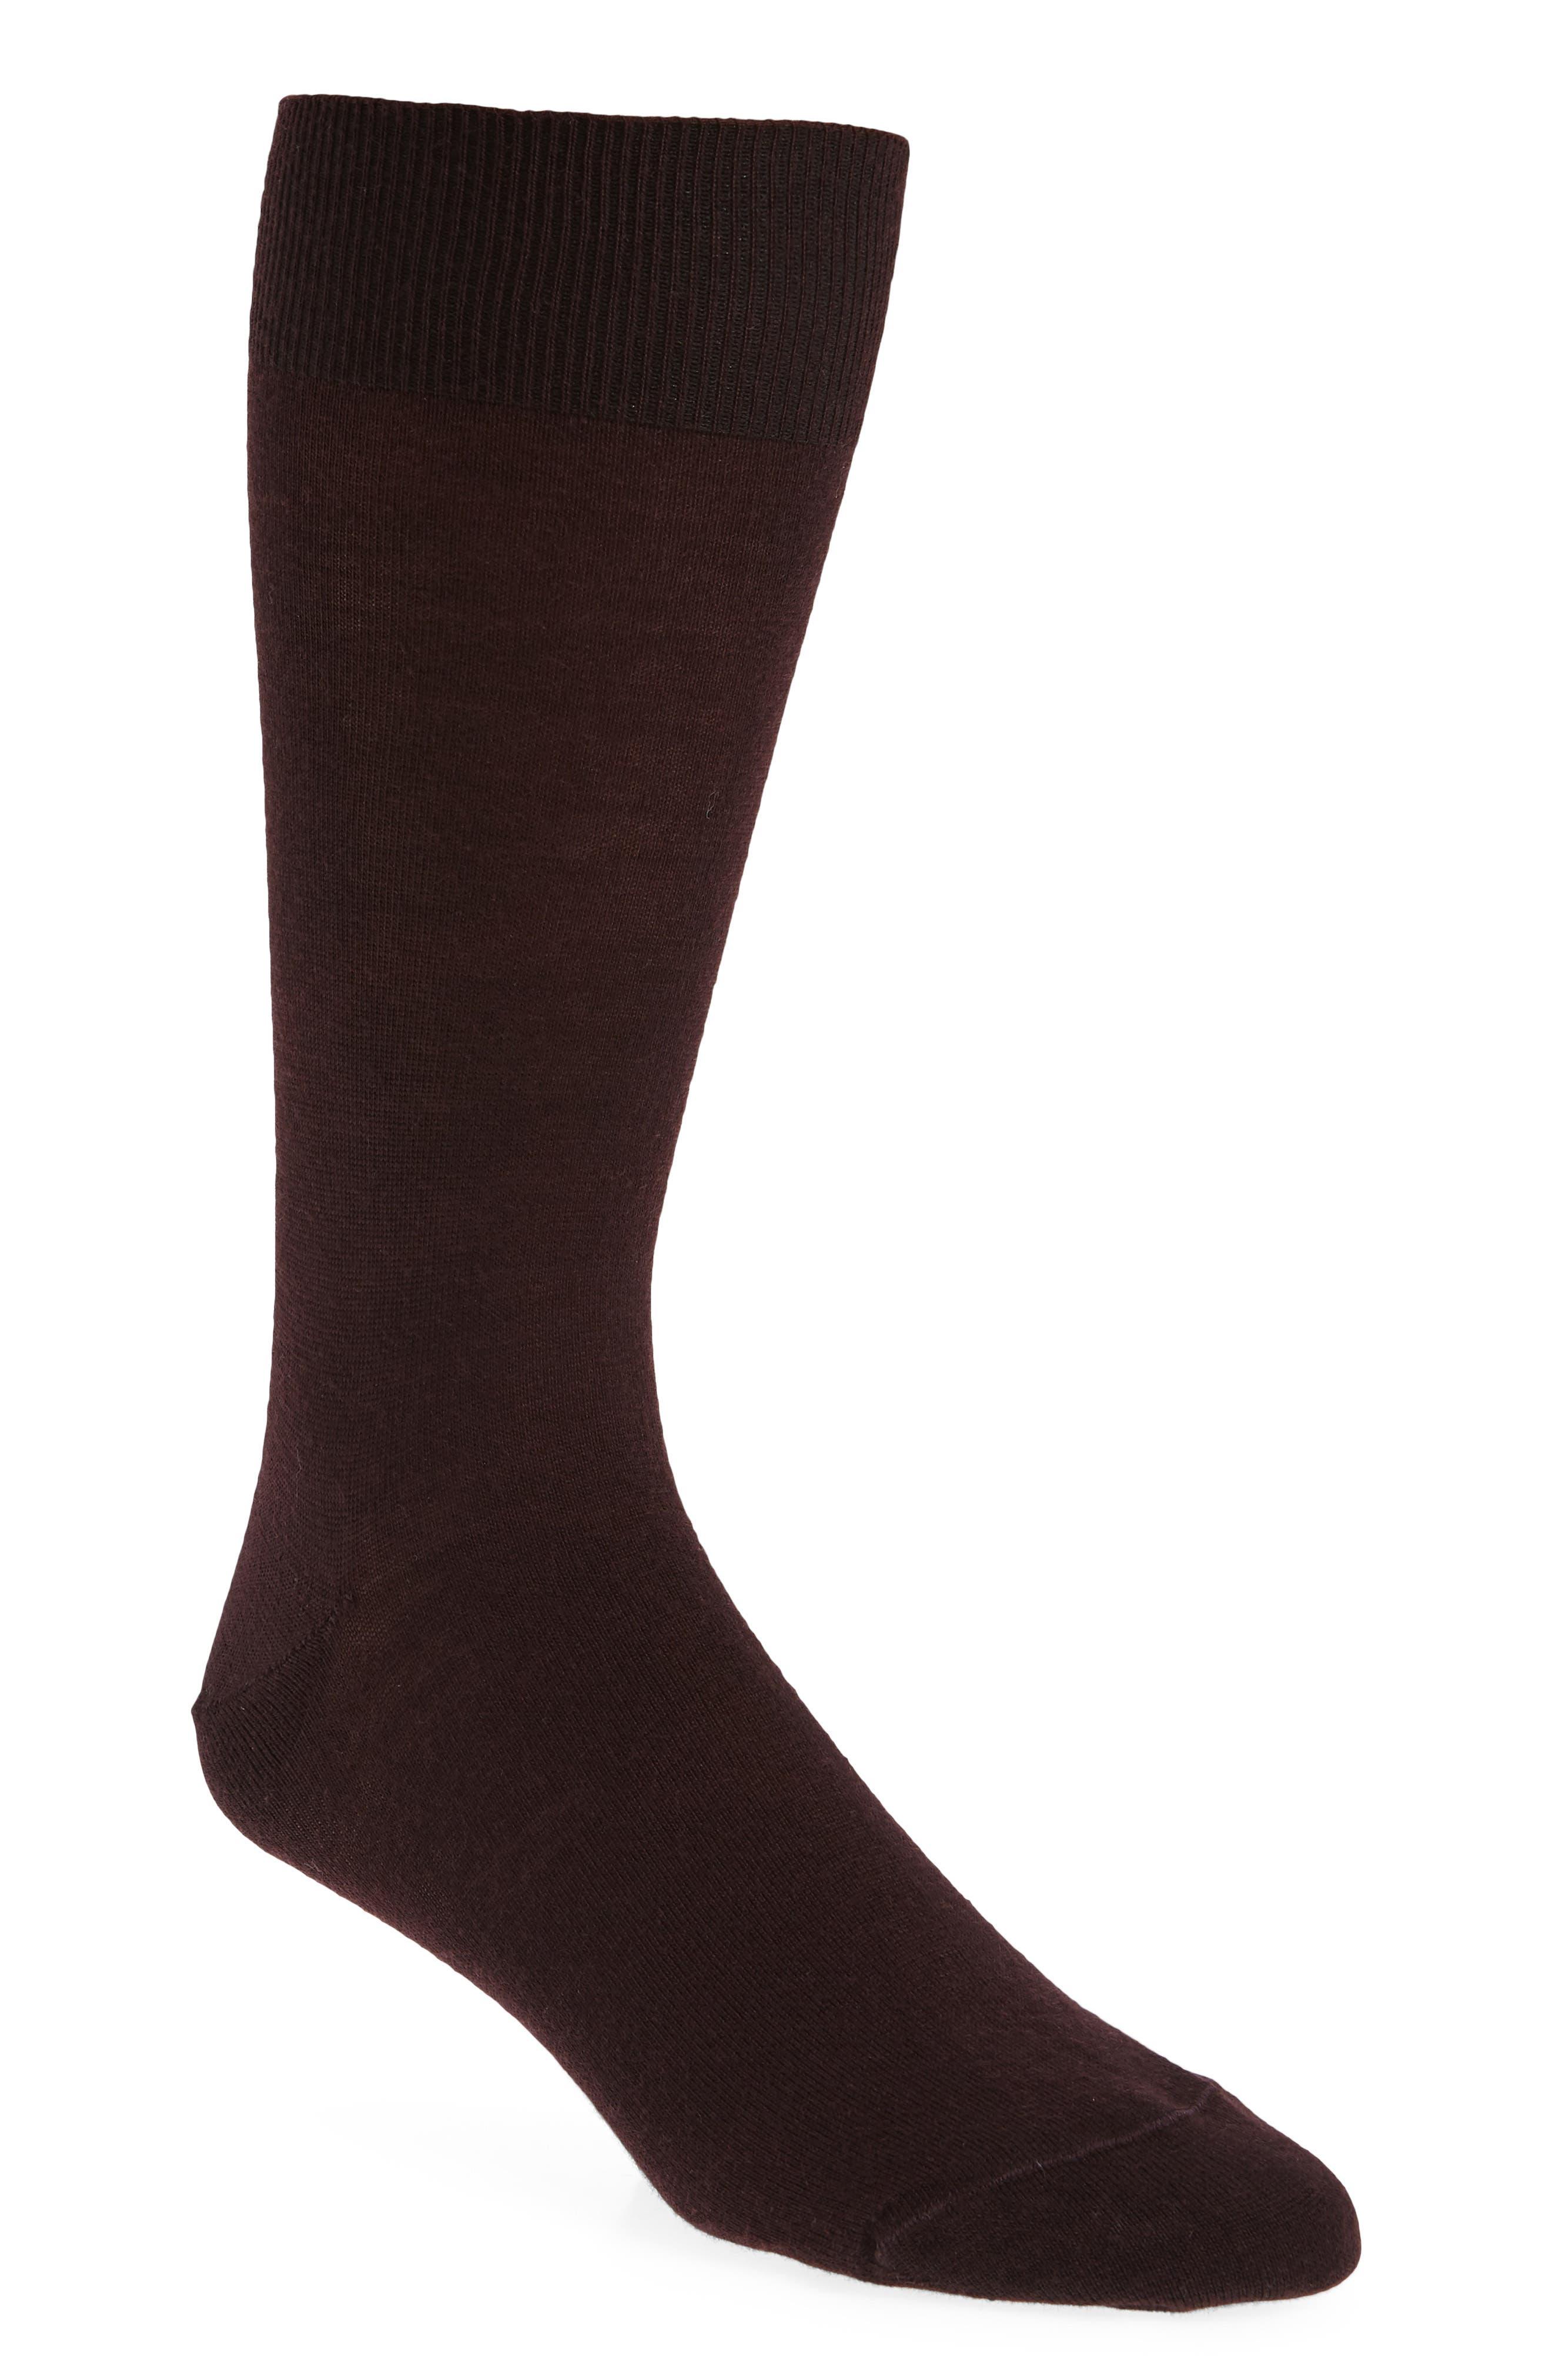 Slack Socks,                         Main,                         color, BURGUNDY STEM